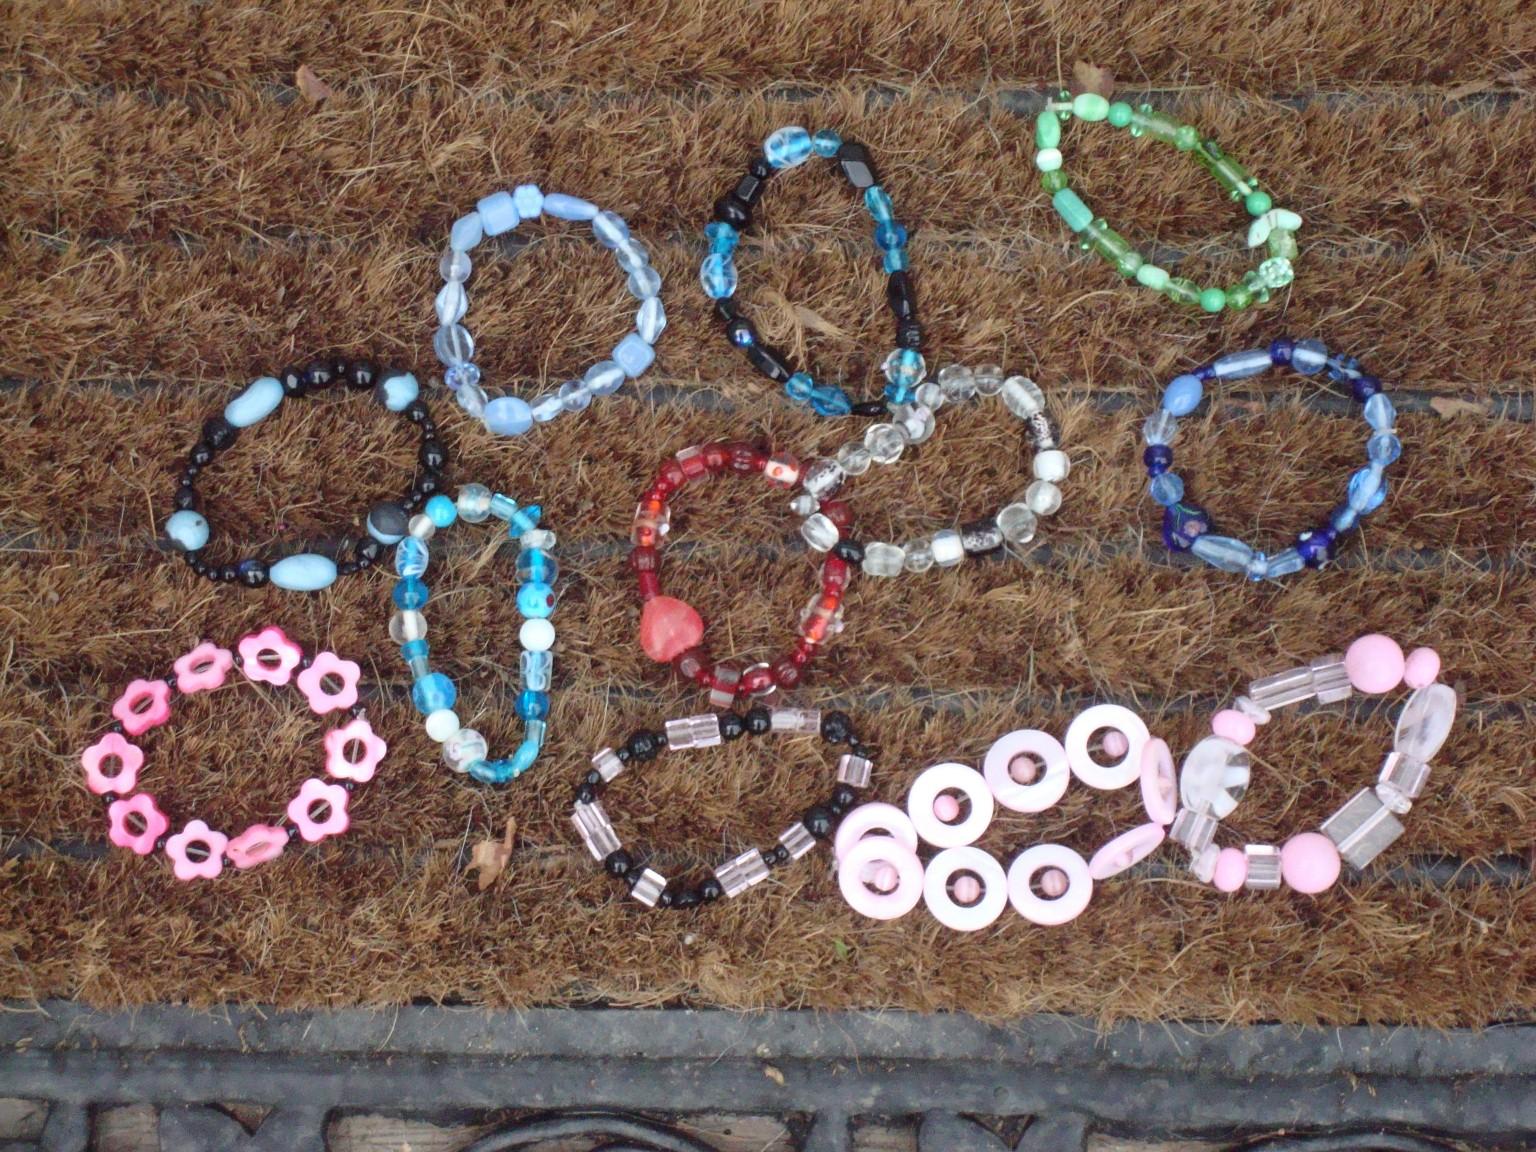 Dlys Hooks and Yarns ~: ~ Sarahsweethearts: Crochet & Questions ~